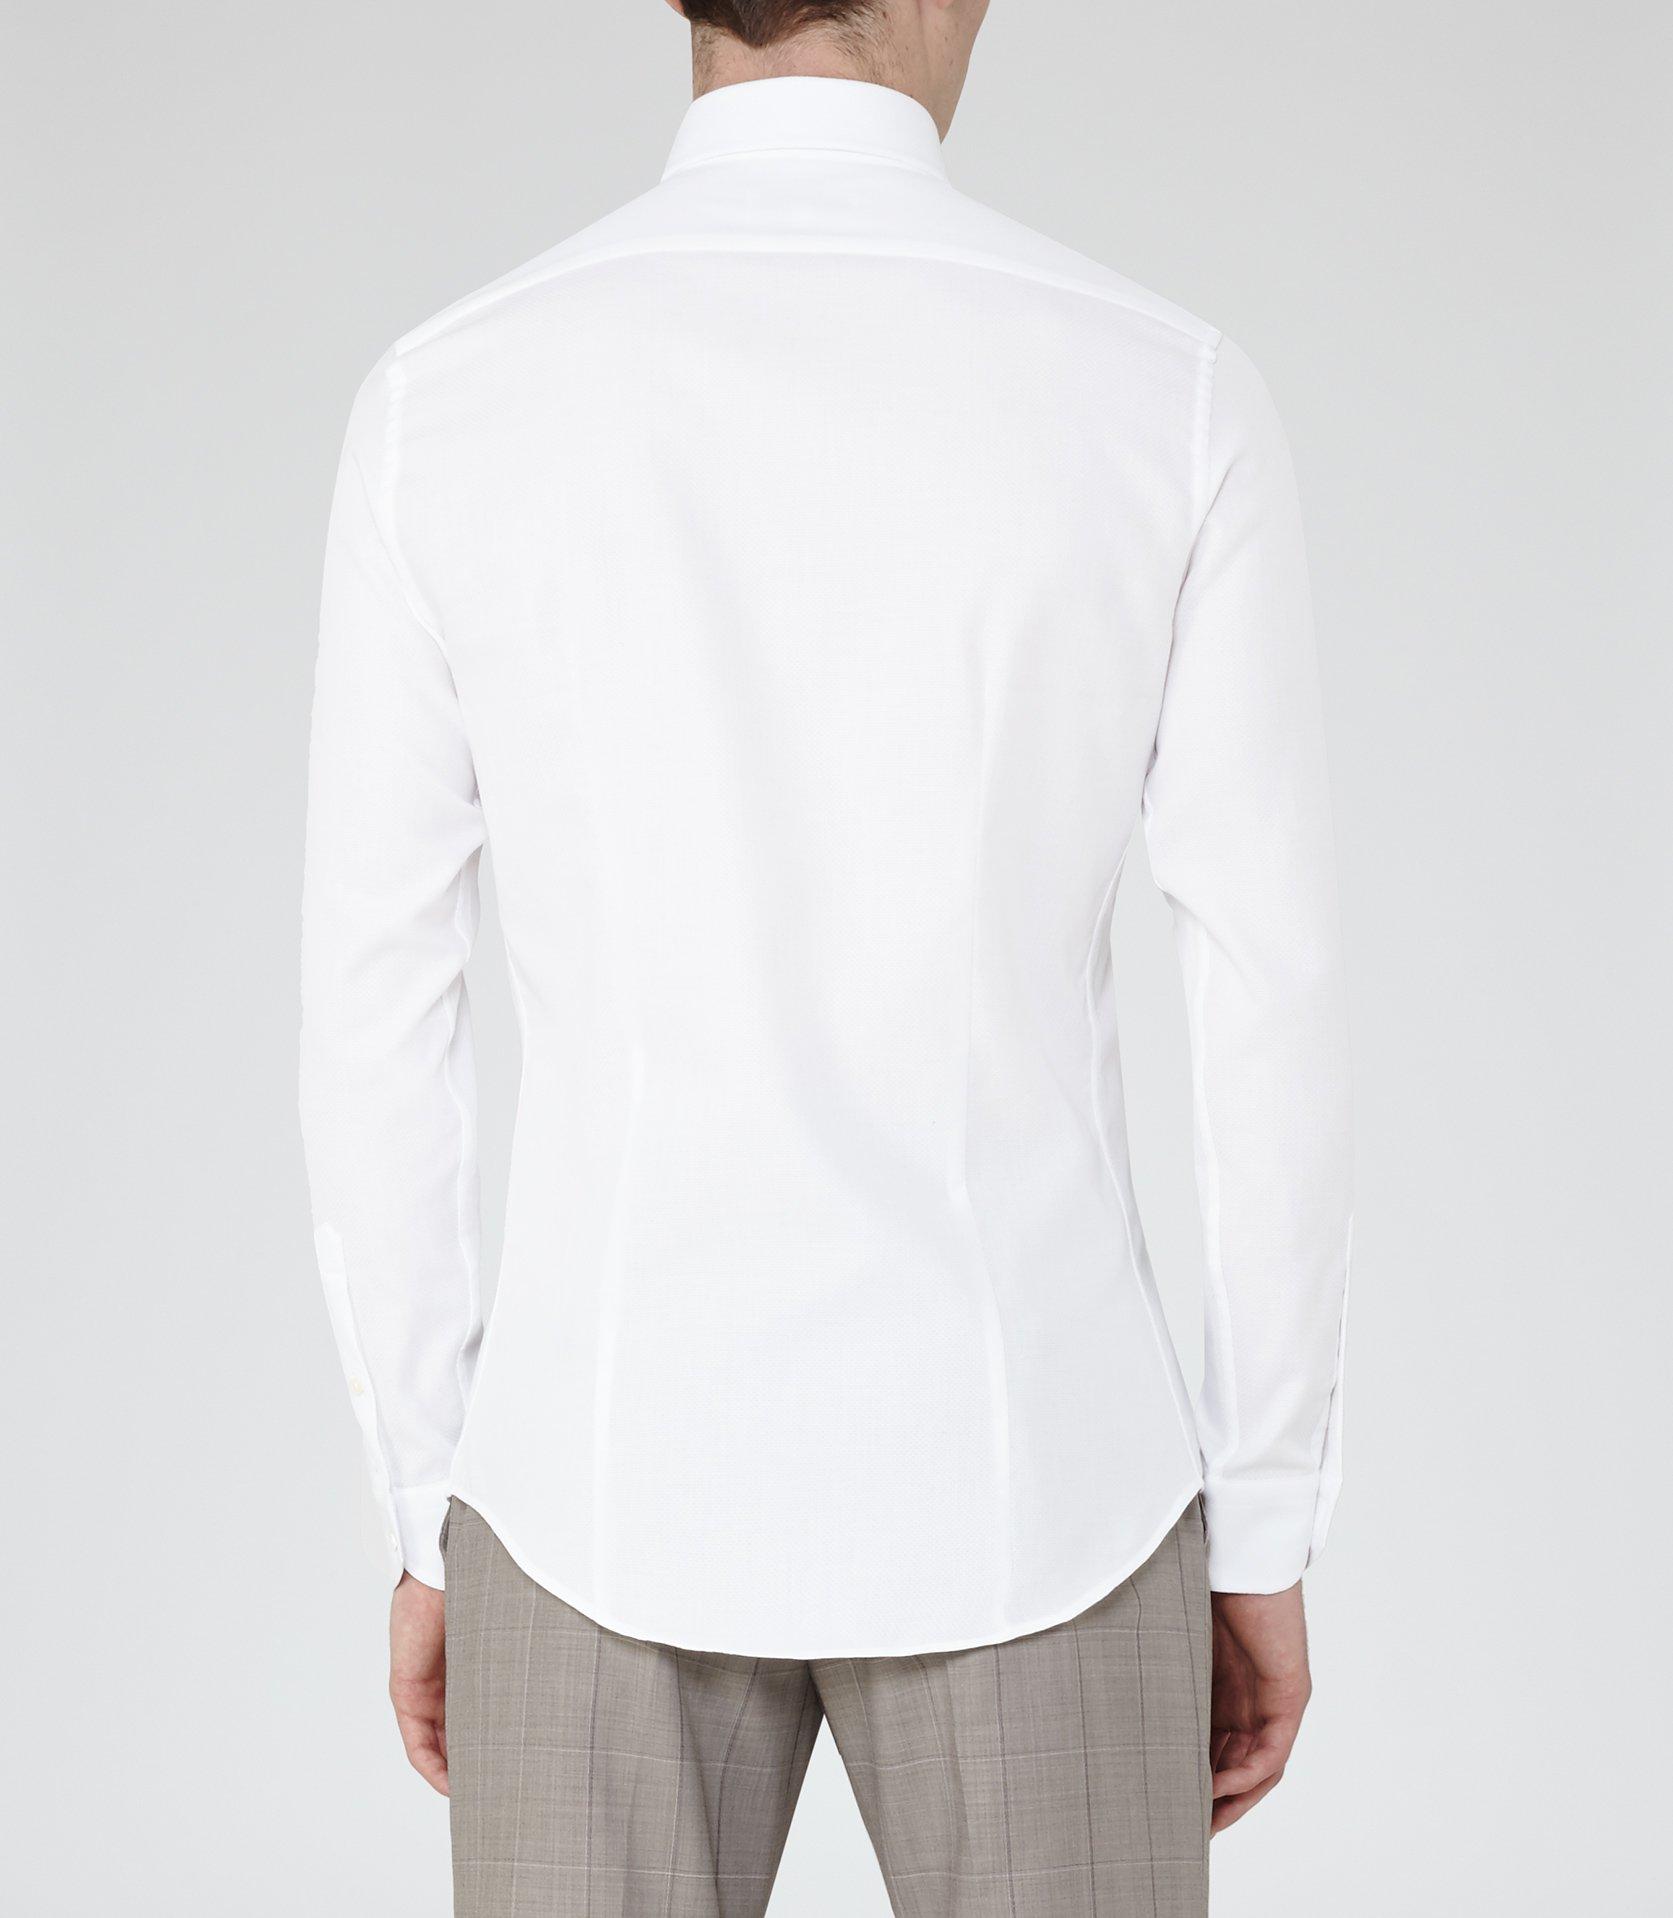 Reiss Brock Cutaway Collar Shirt In White For Men Lyst